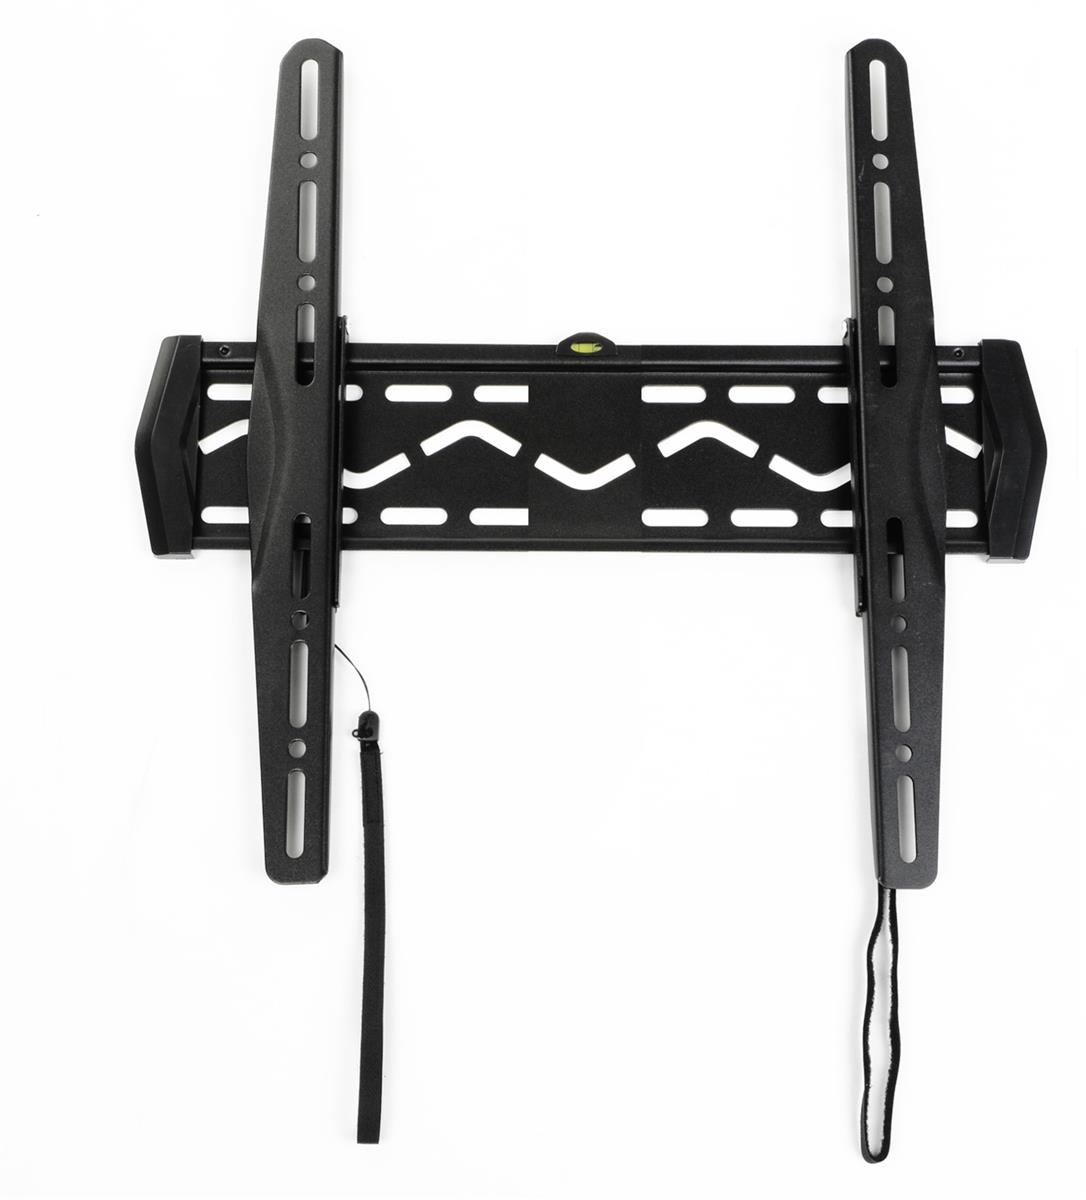 flat panel tv mount 32 to 70 monitors w built in level. Black Bedroom Furniture Sets. Home Design Ideas